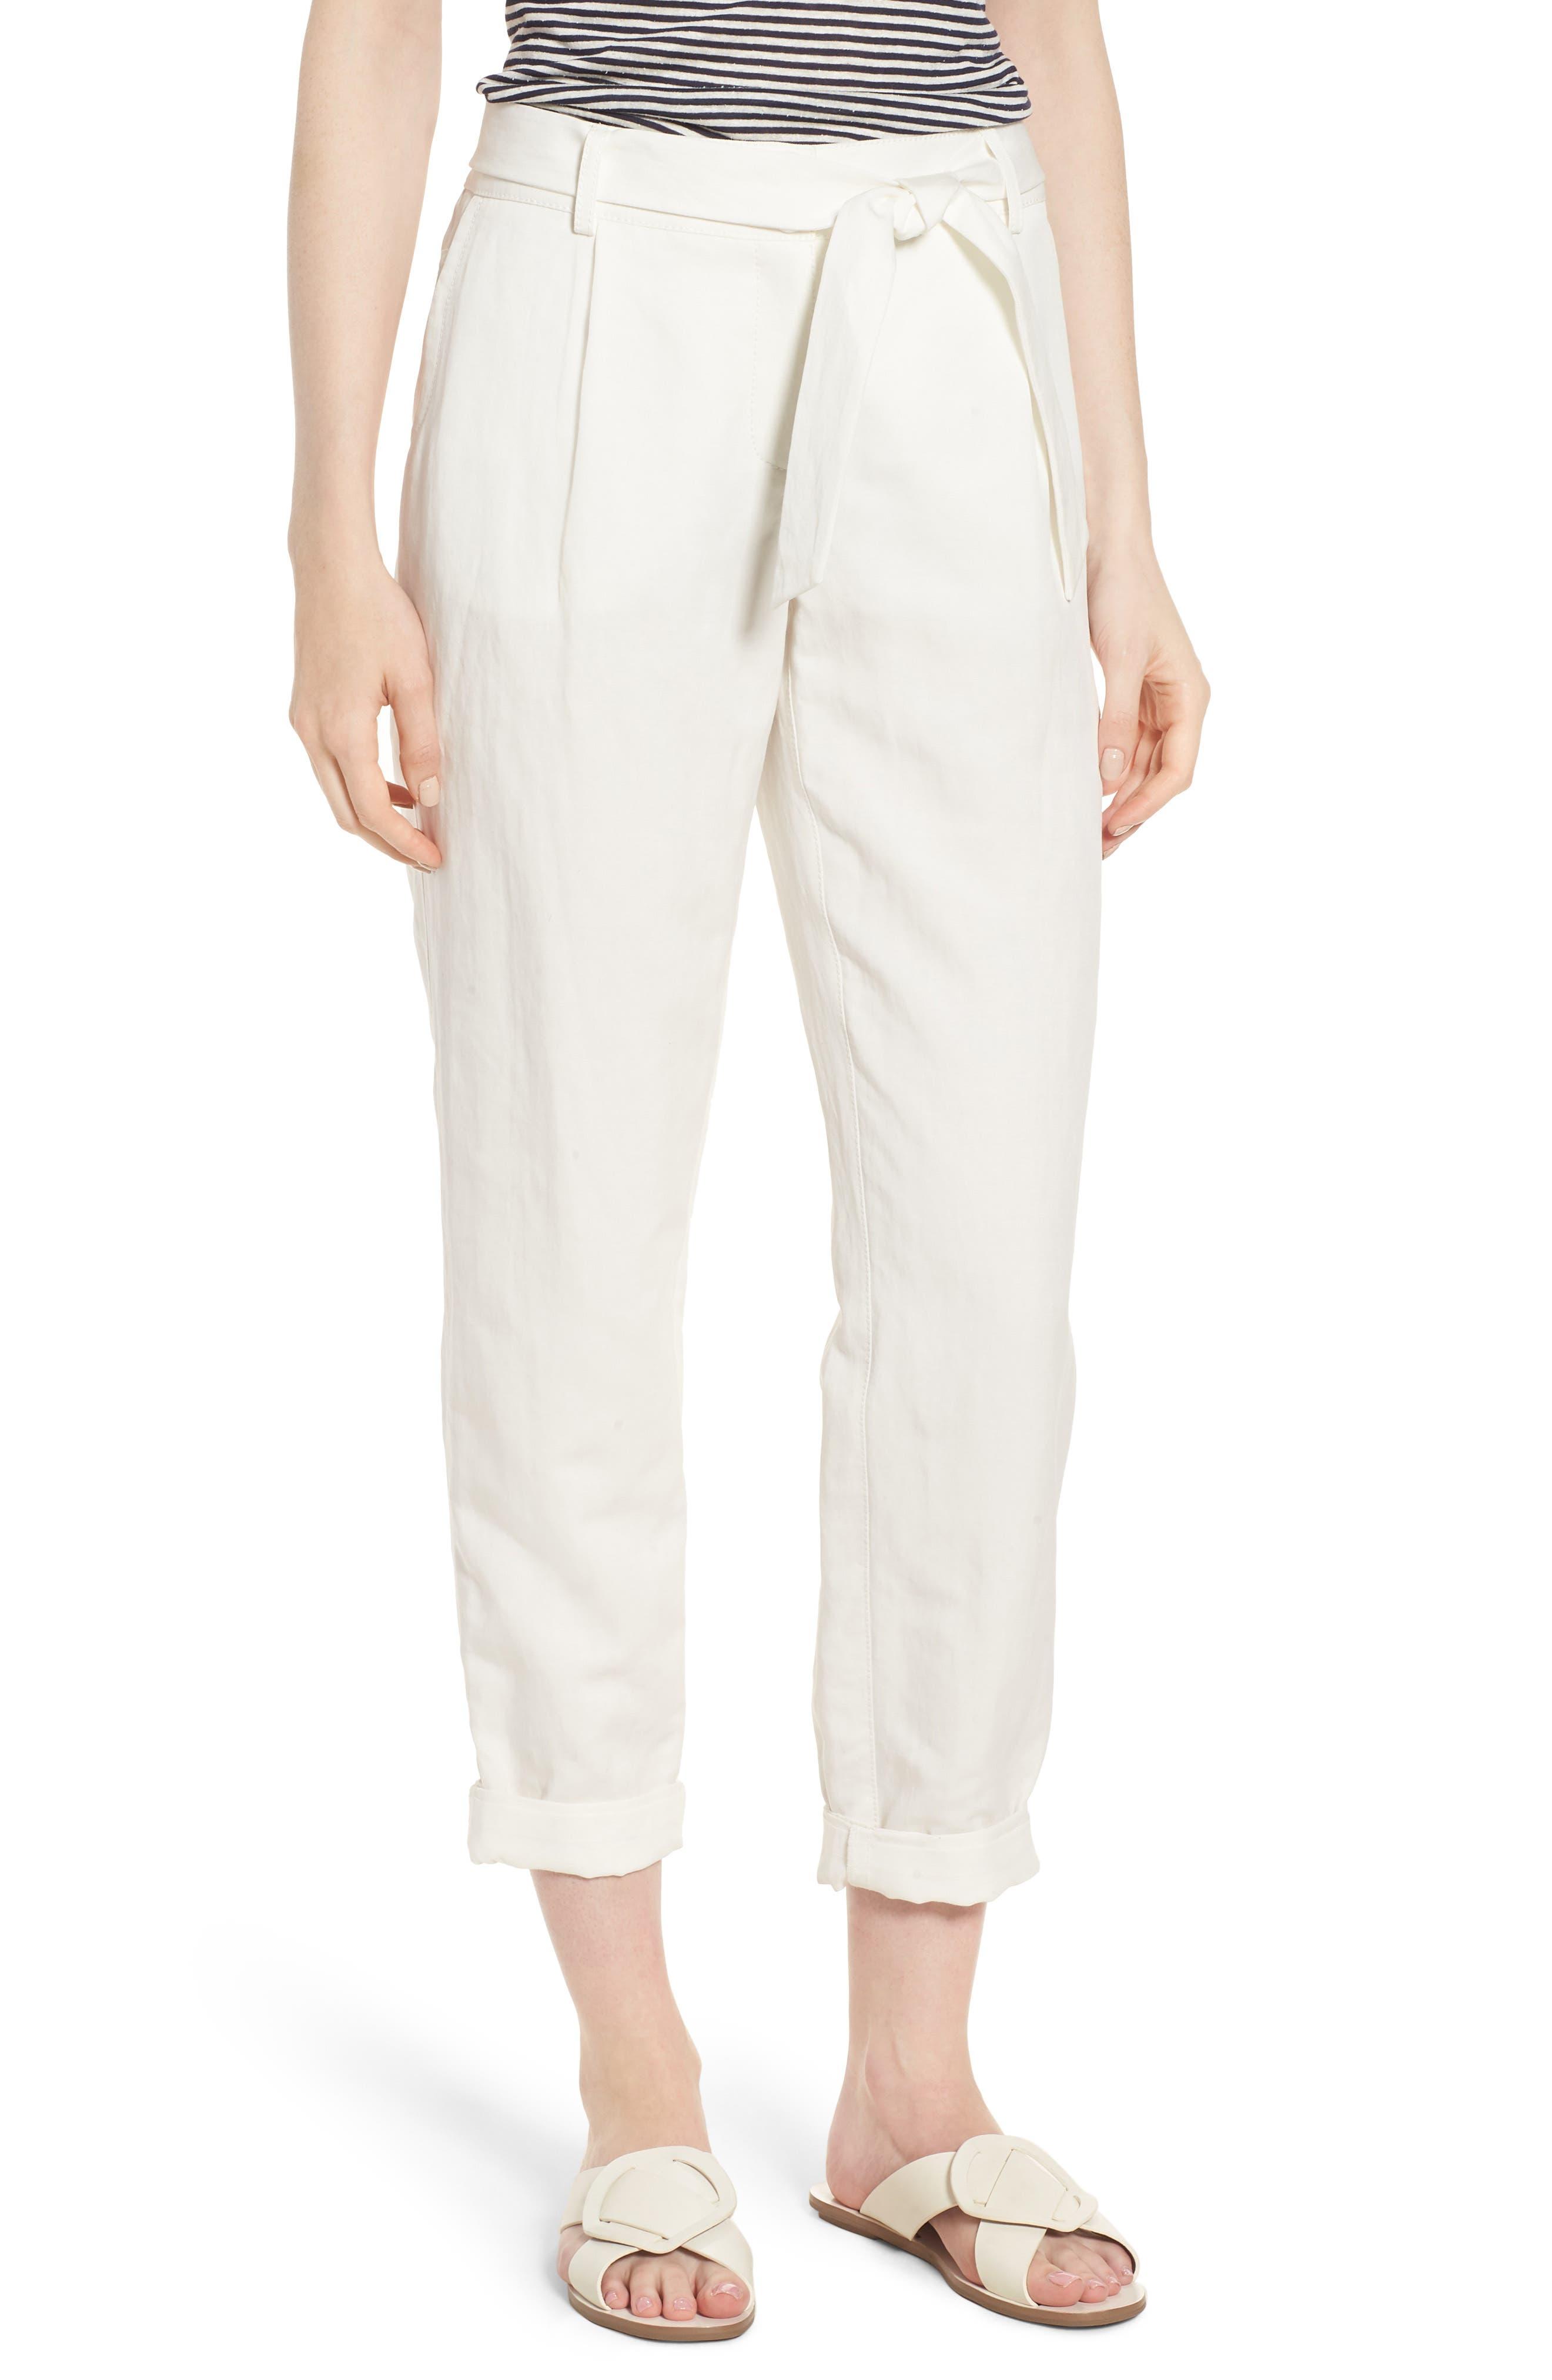 Nordstrom Signature Linen Blend Tie Waist Pants